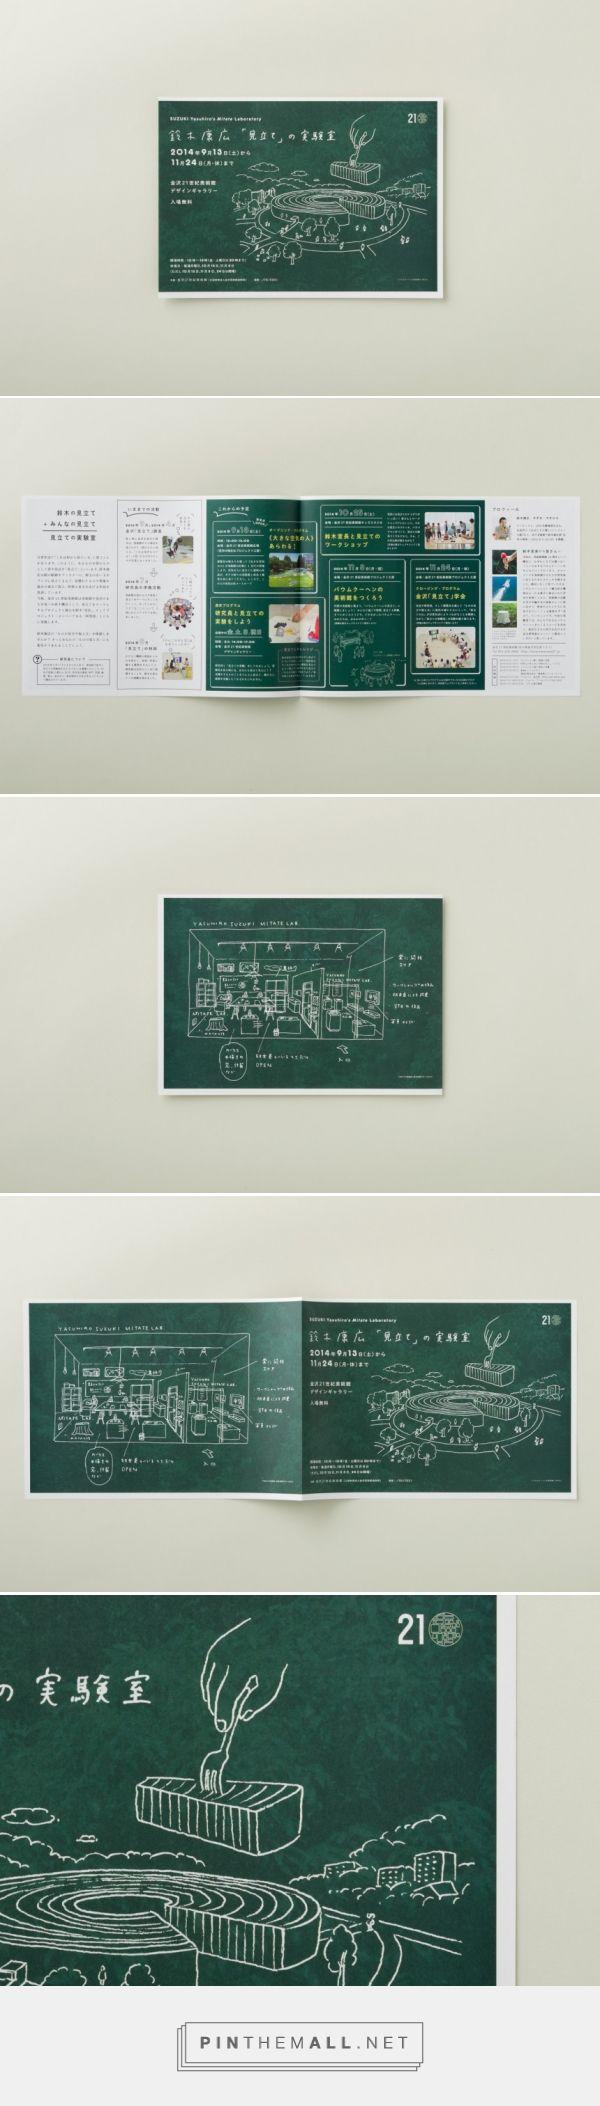 SUZUKI Yasuhiro's Mitate Laboratory : UMA / design farm... - a grouped images picture - Pin Them All